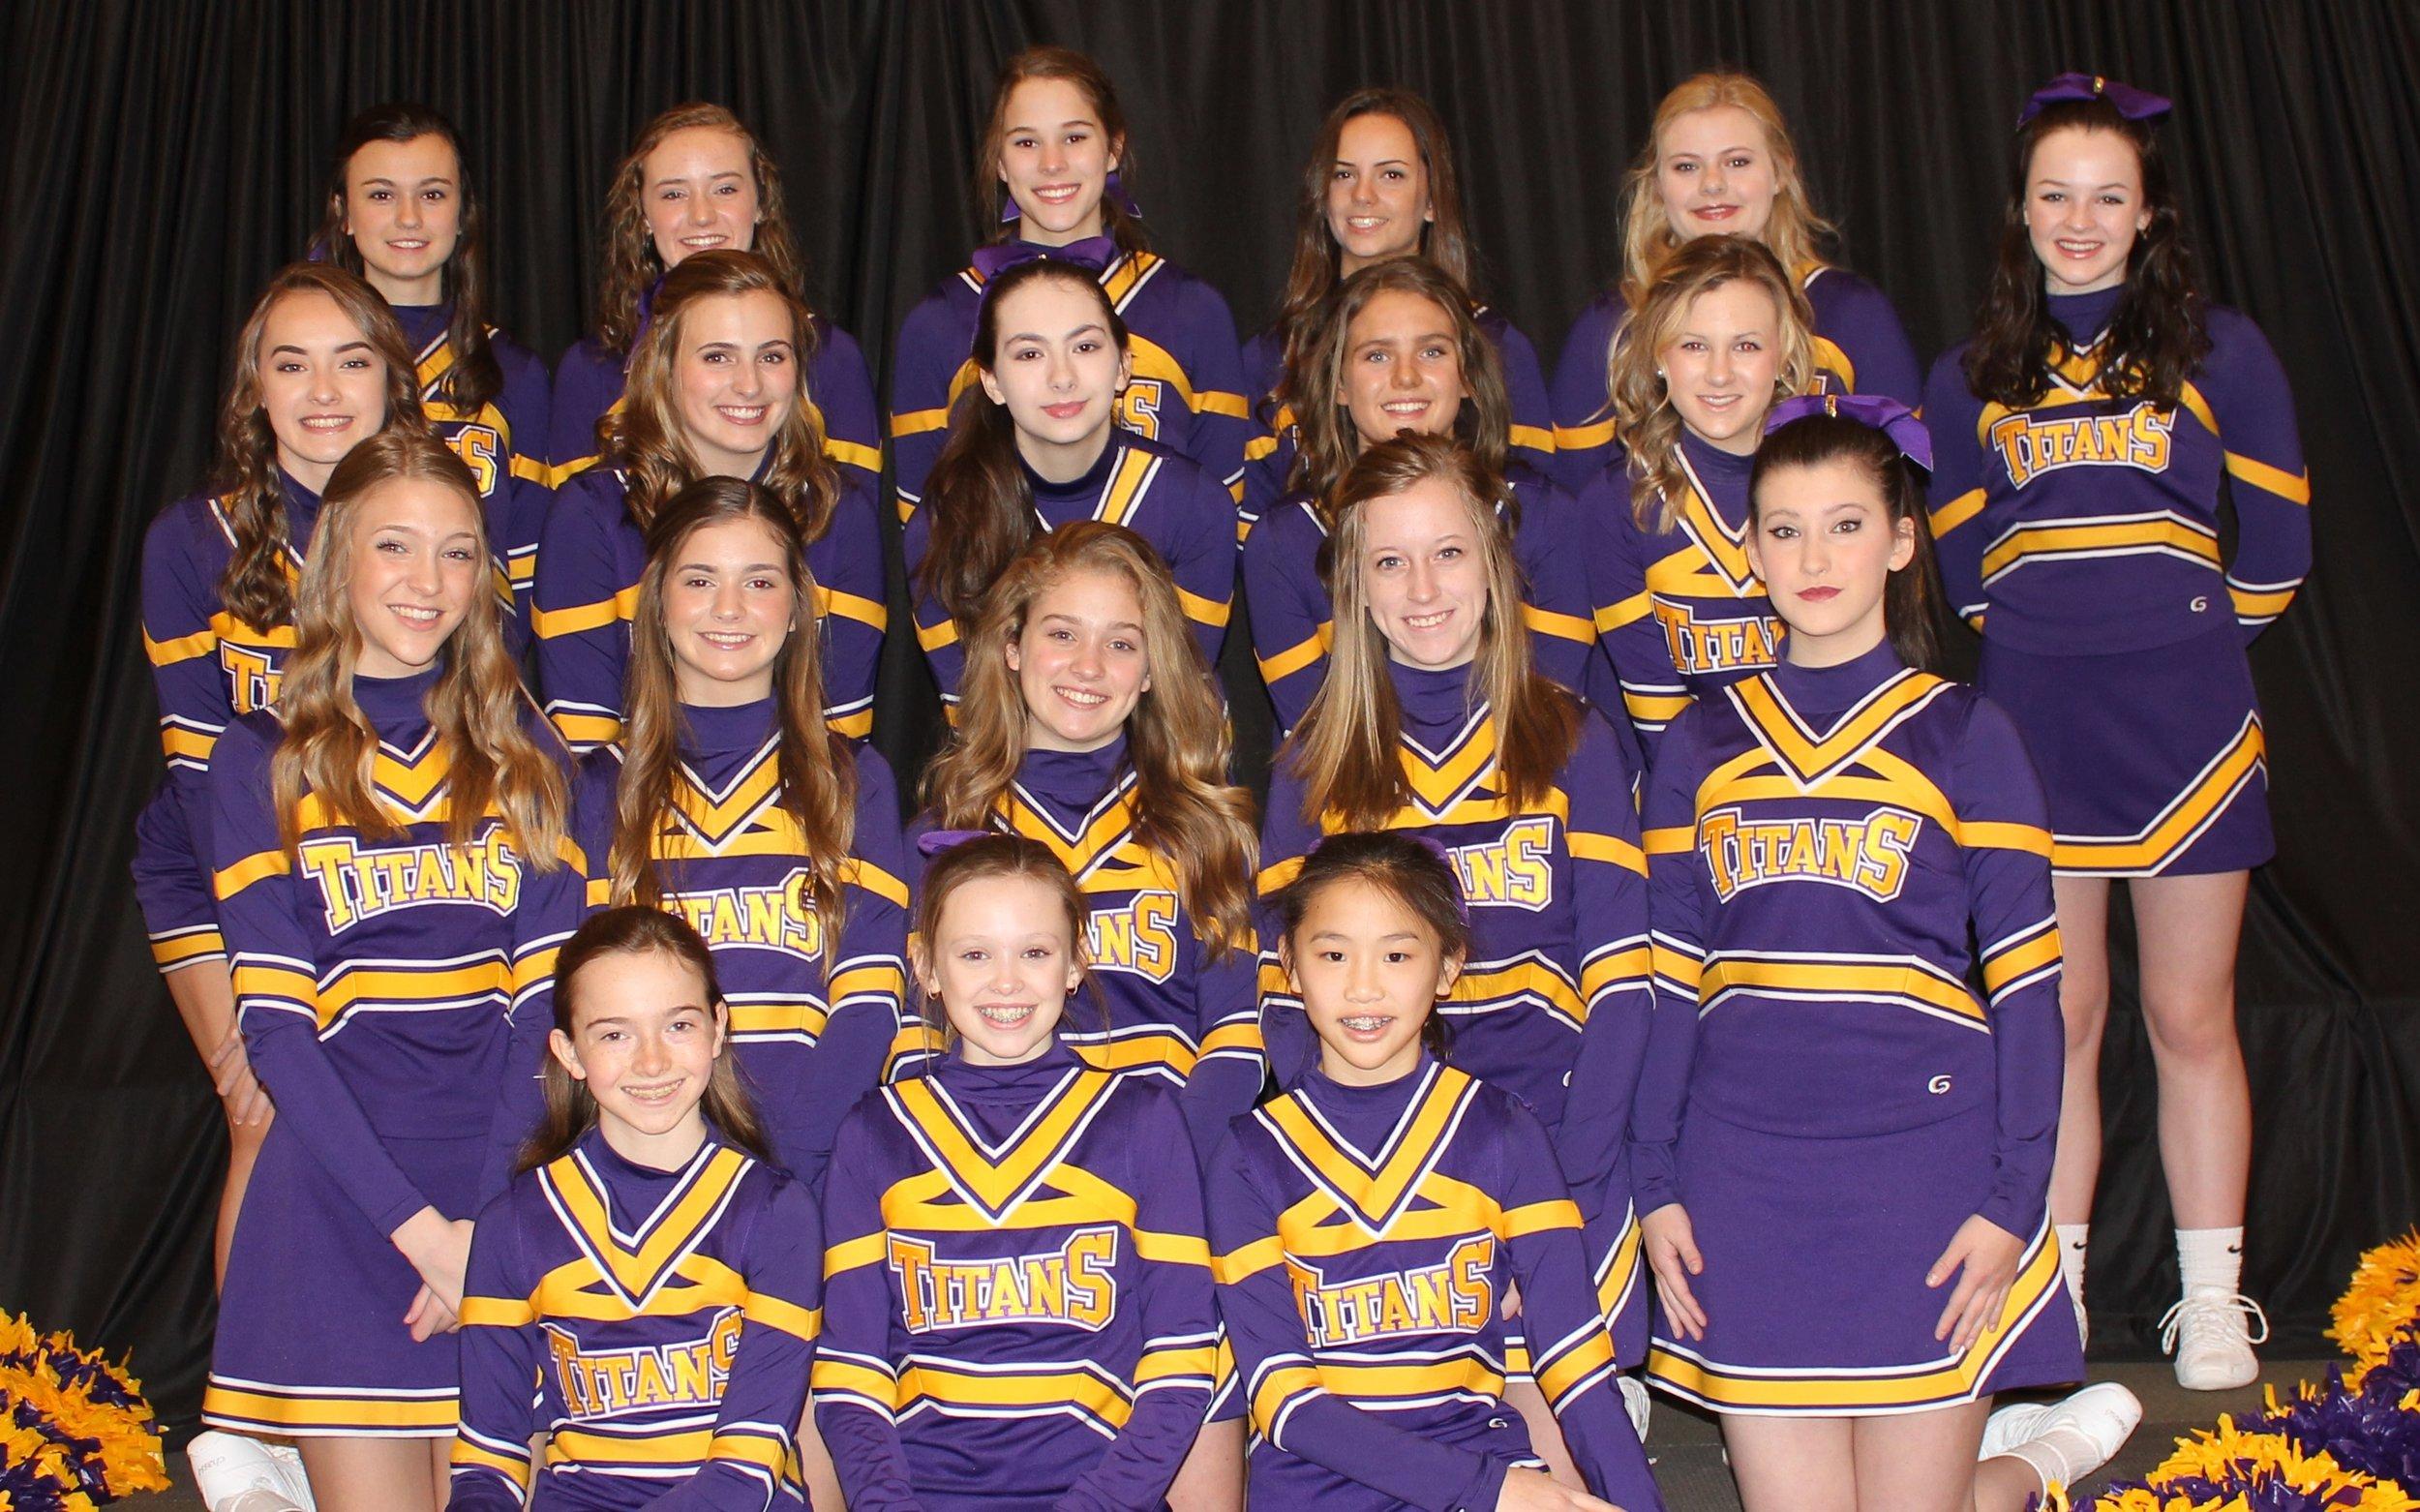 2018-19 Cheerleaders team